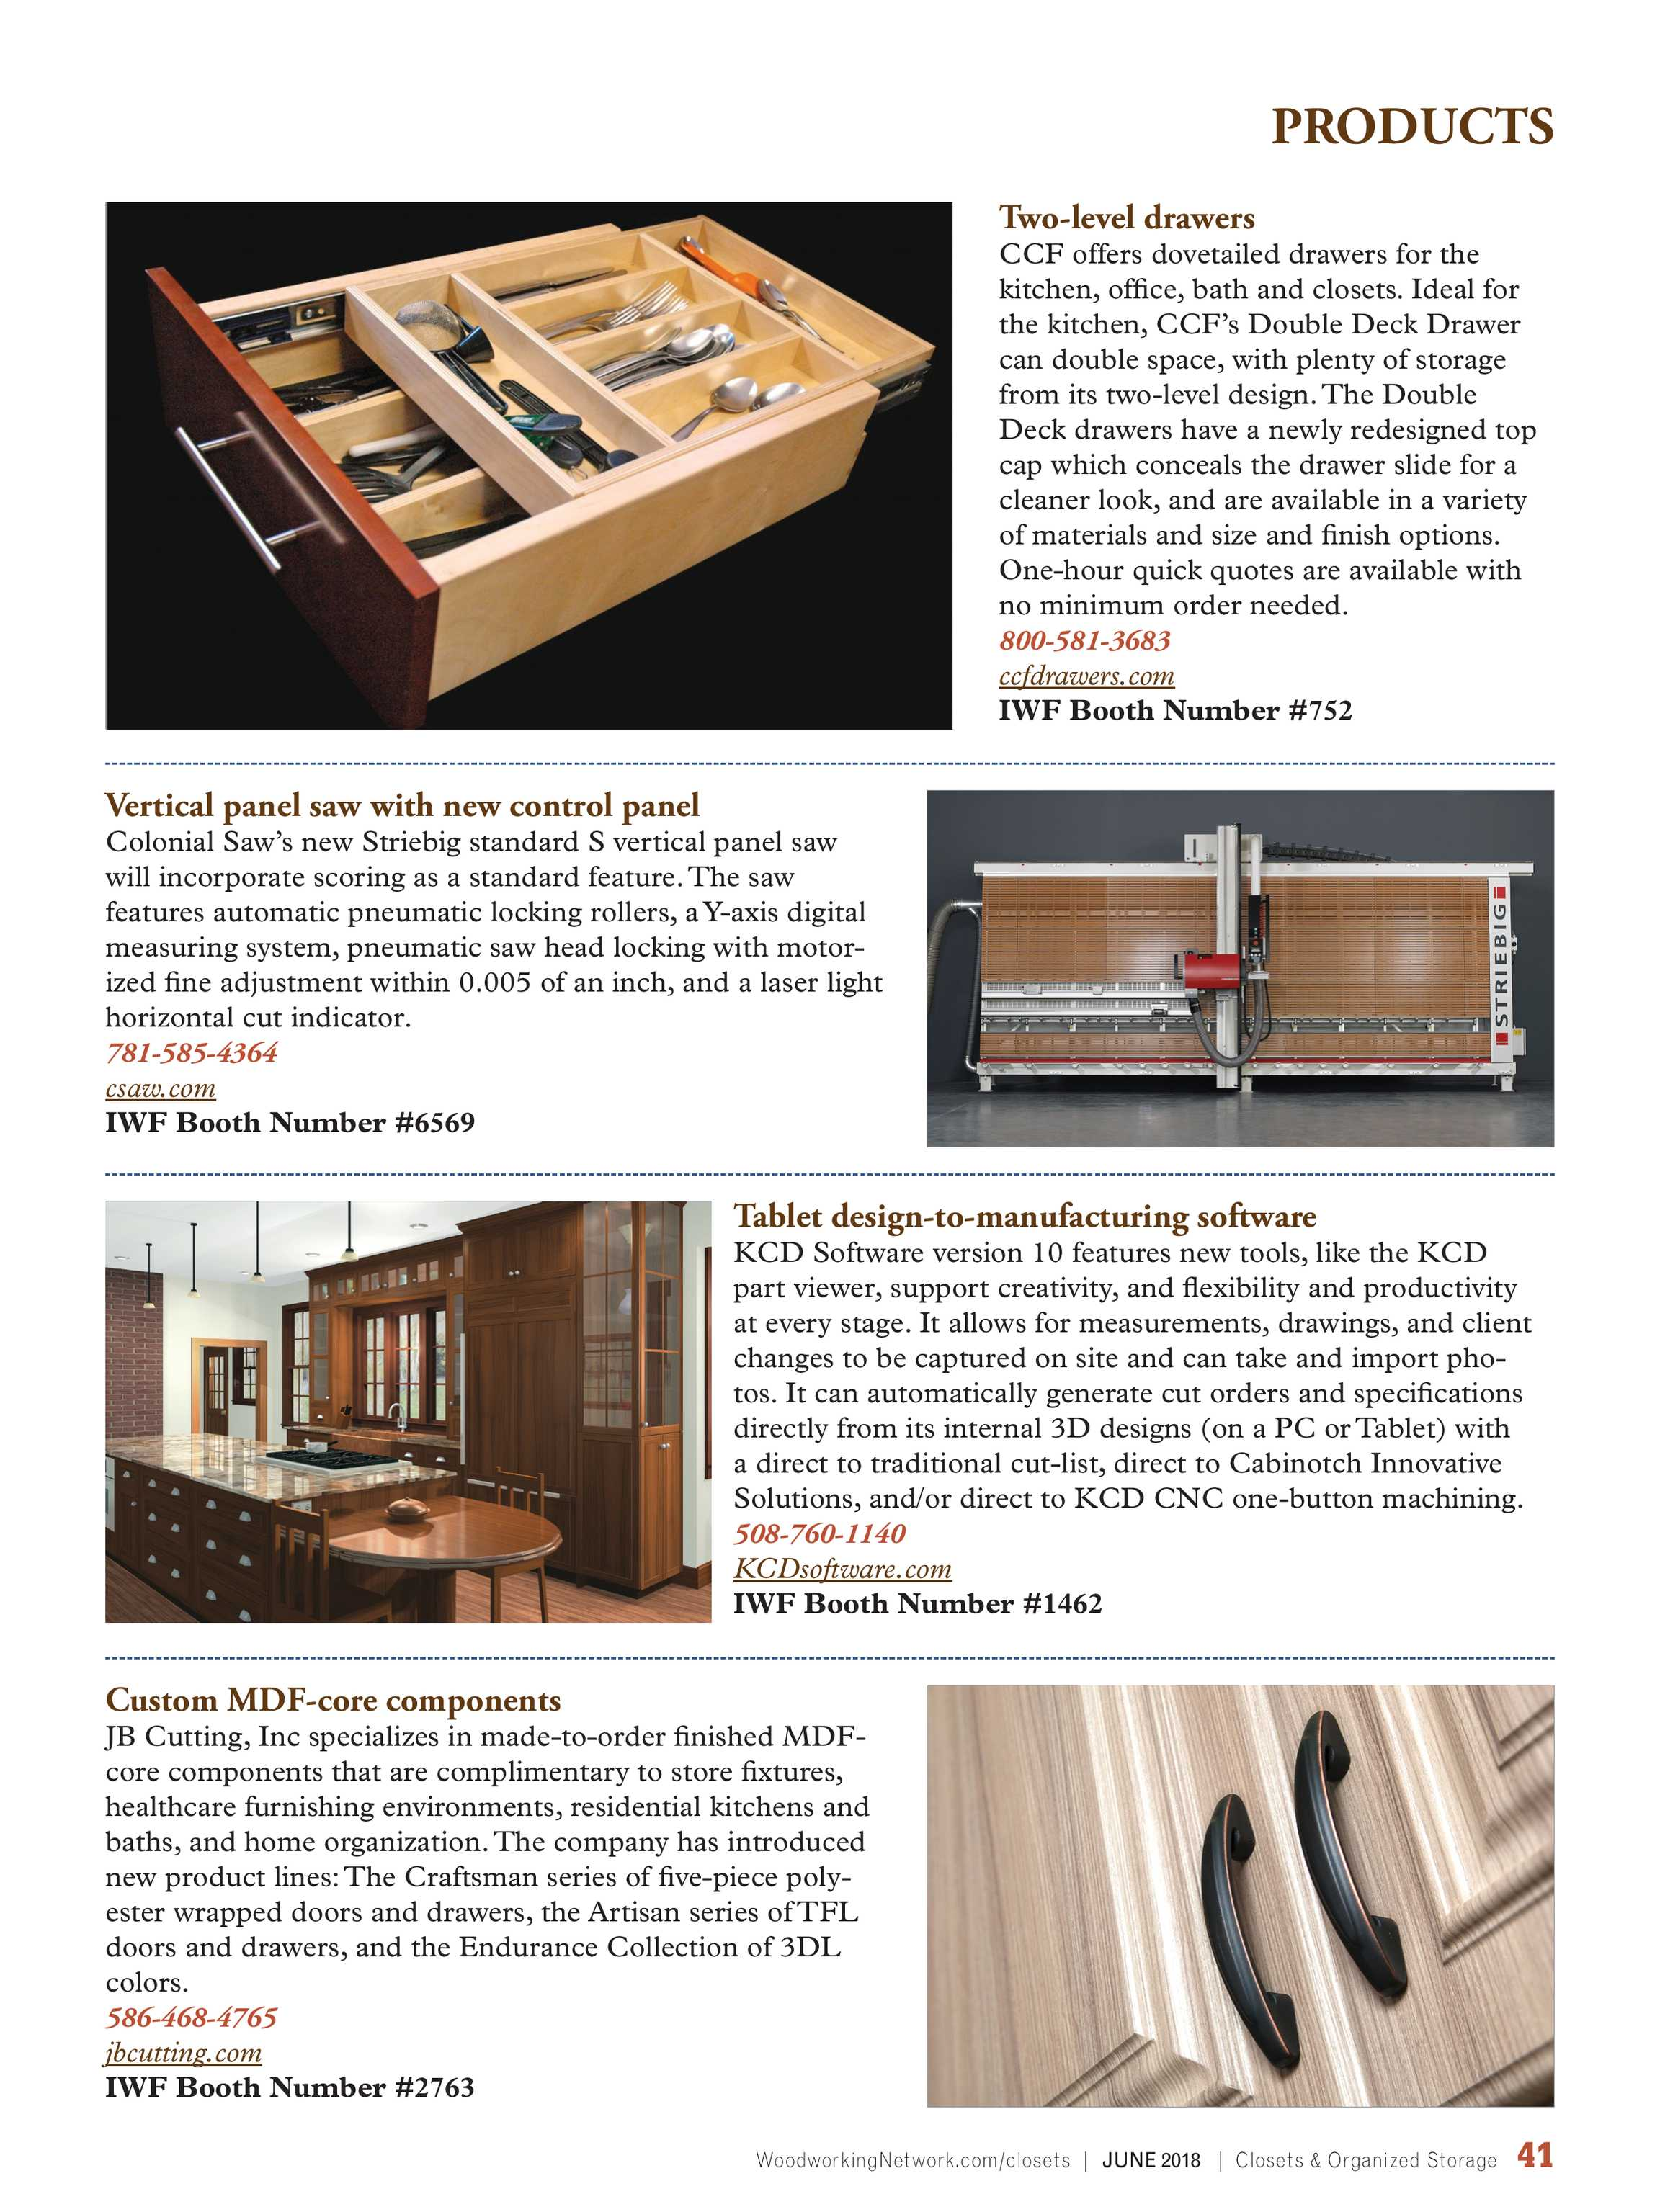 Closets Magazine - June_2018 - page 41